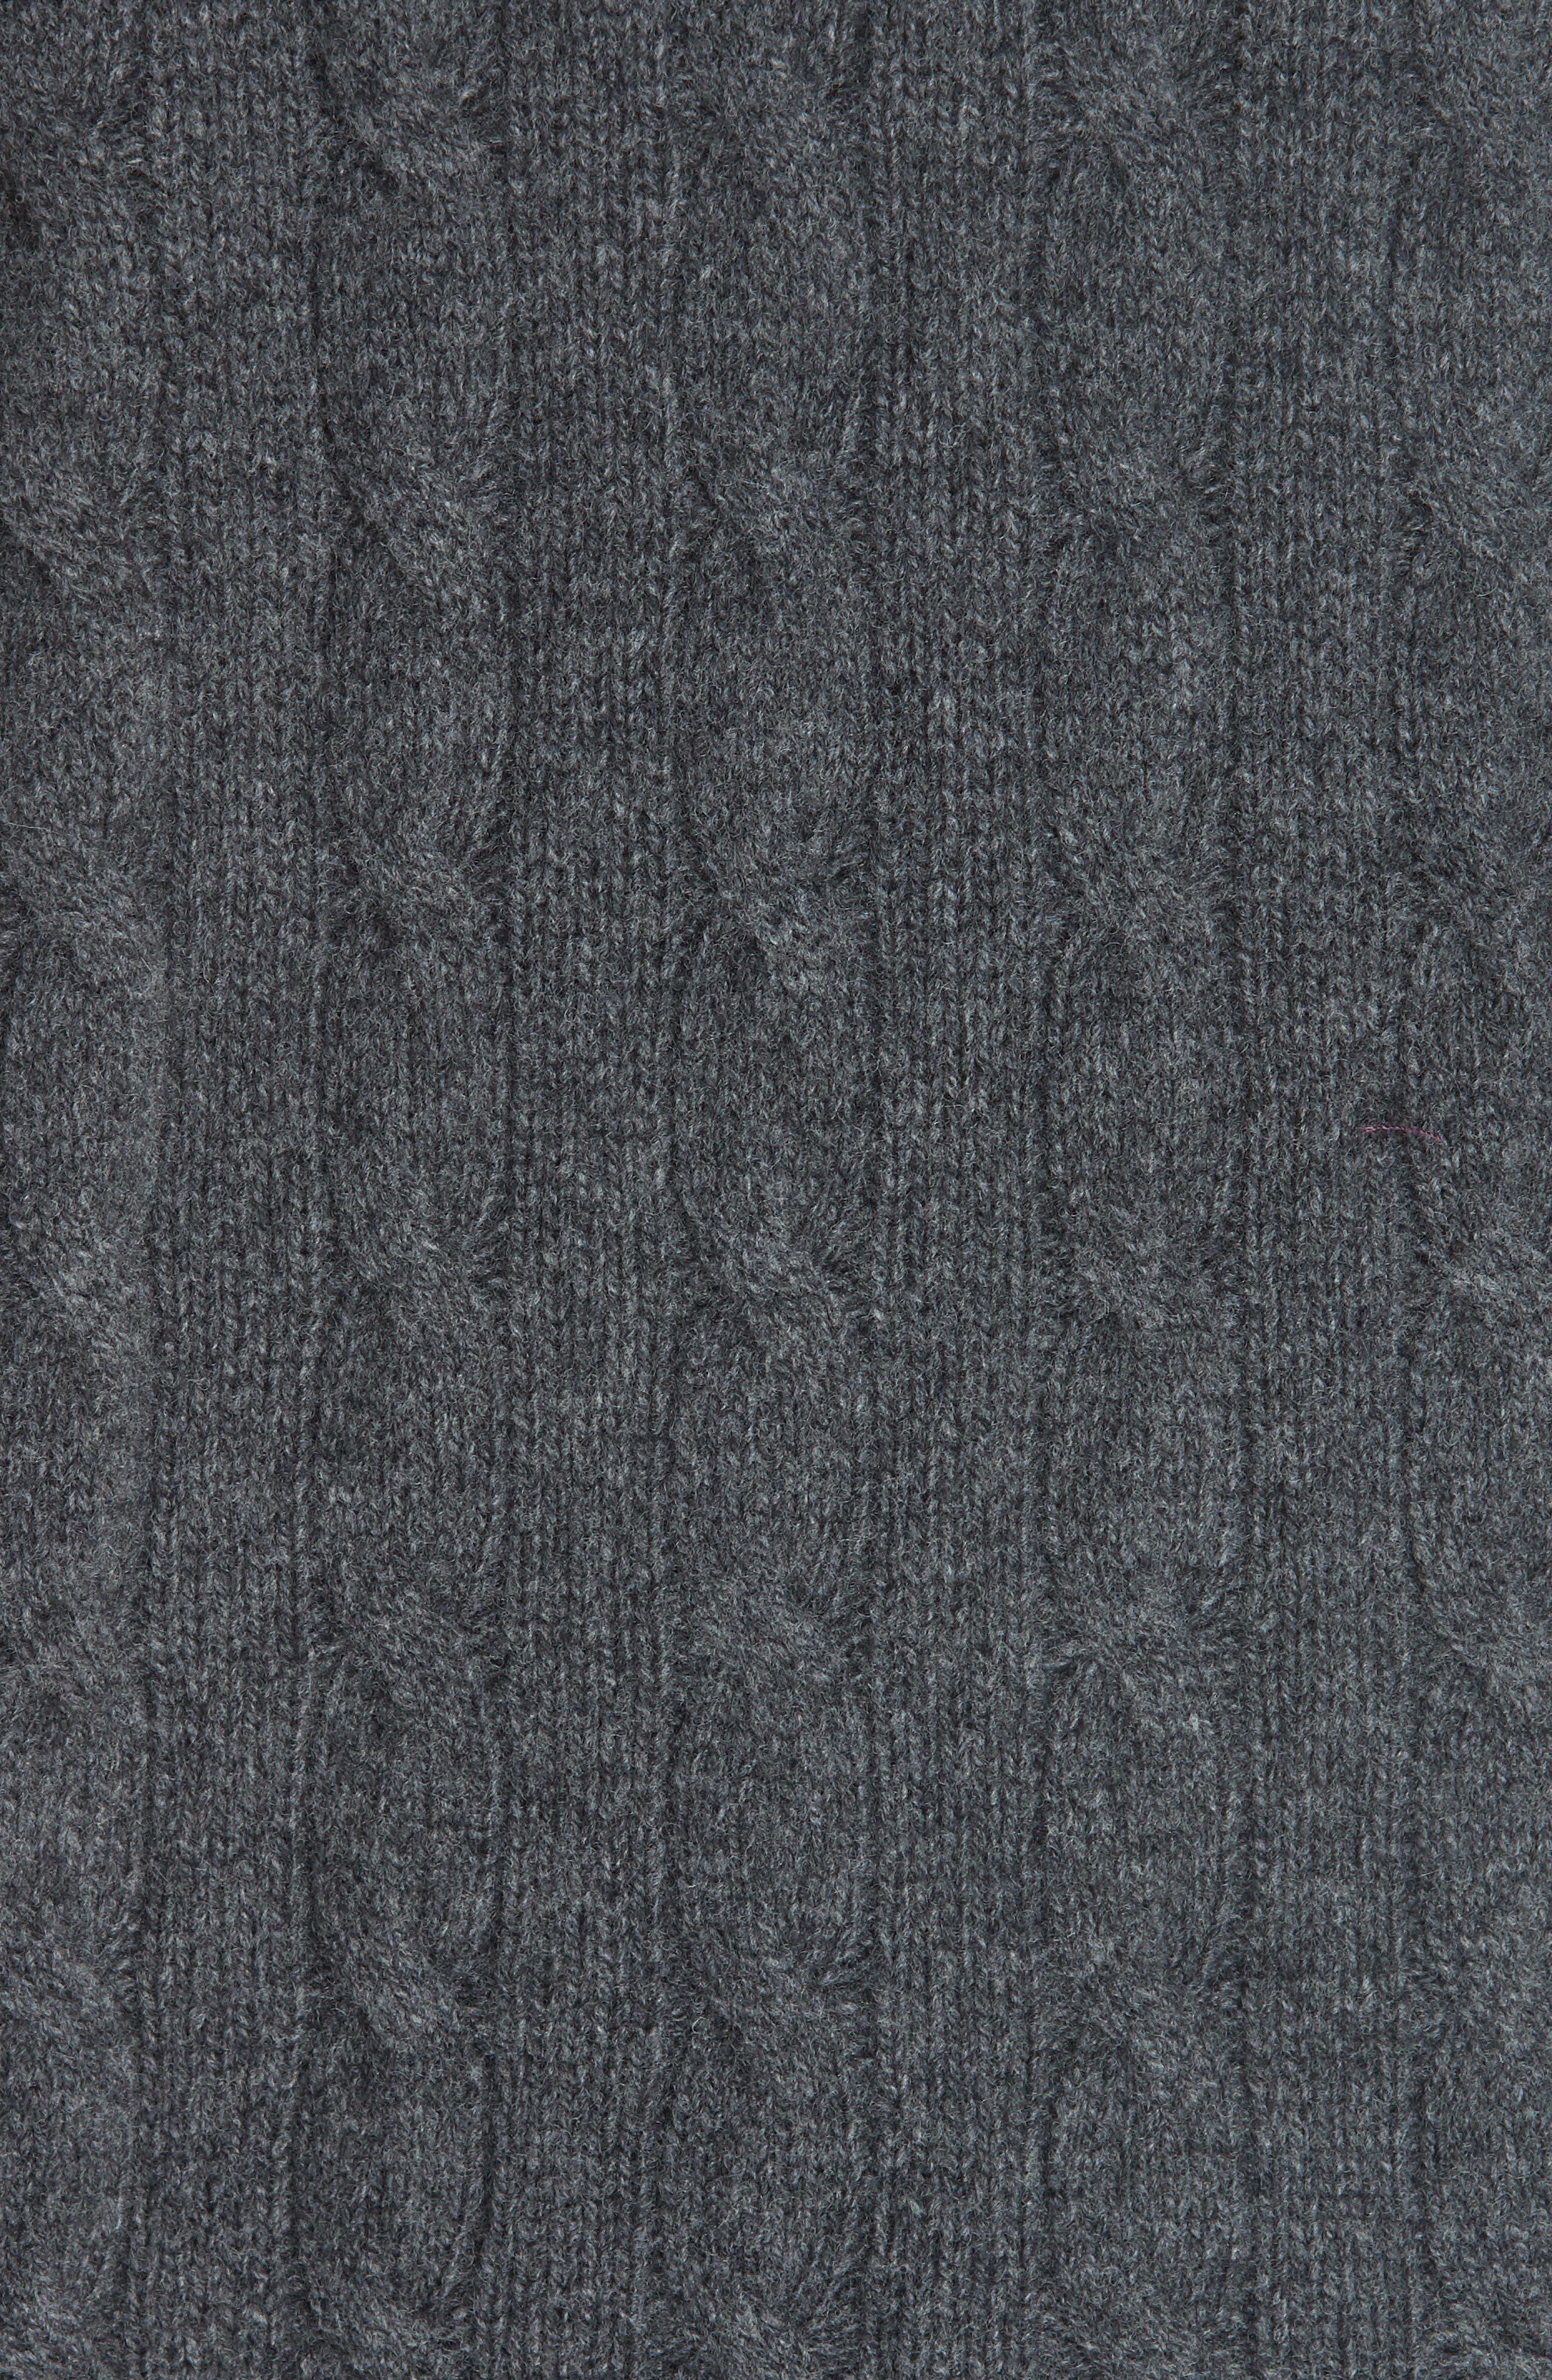 Side Slit Cable Turtleneck,                             Alternate thumbnail 5, color,                             020